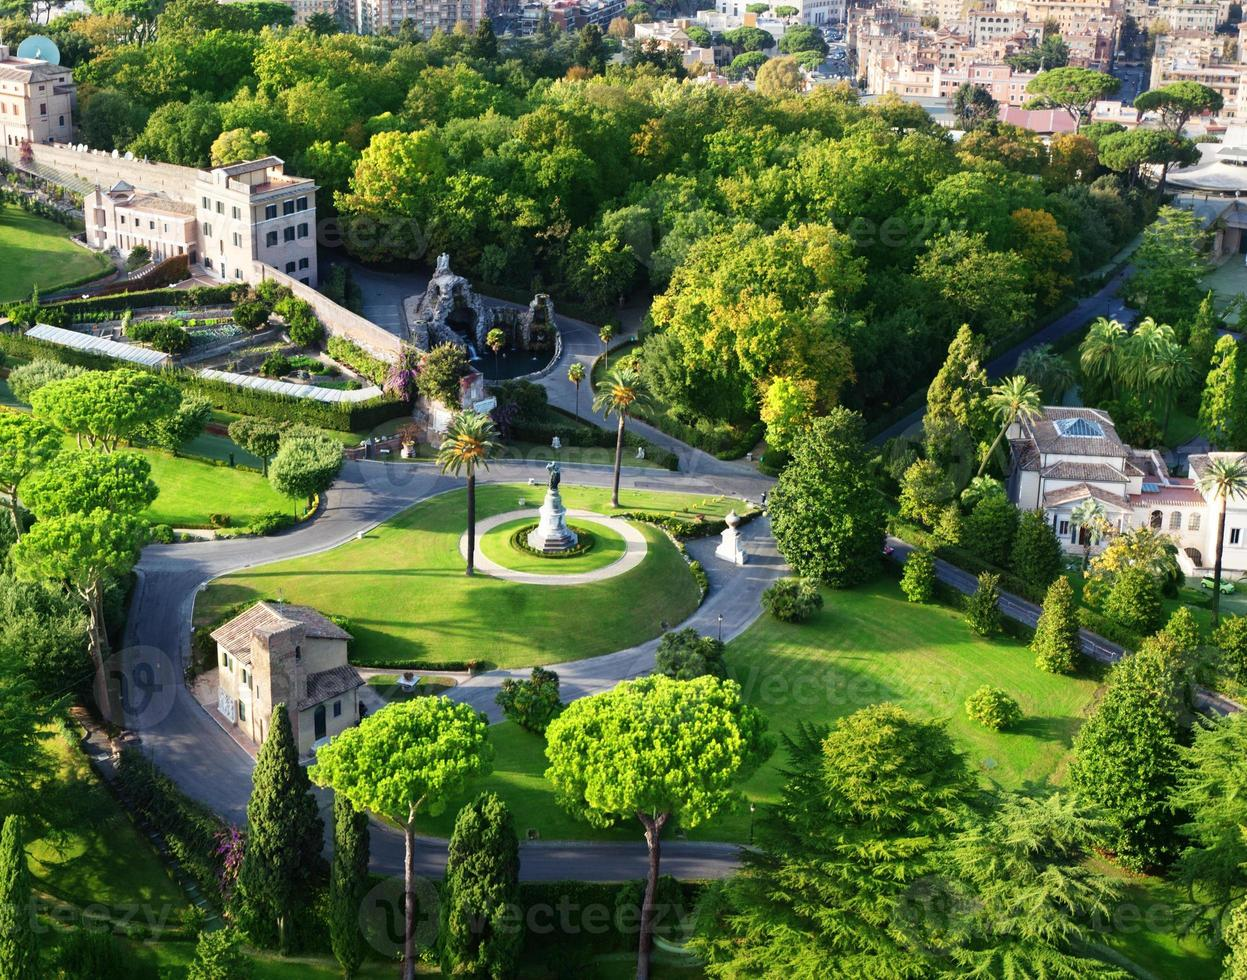 jardins do vaticano, roma foto